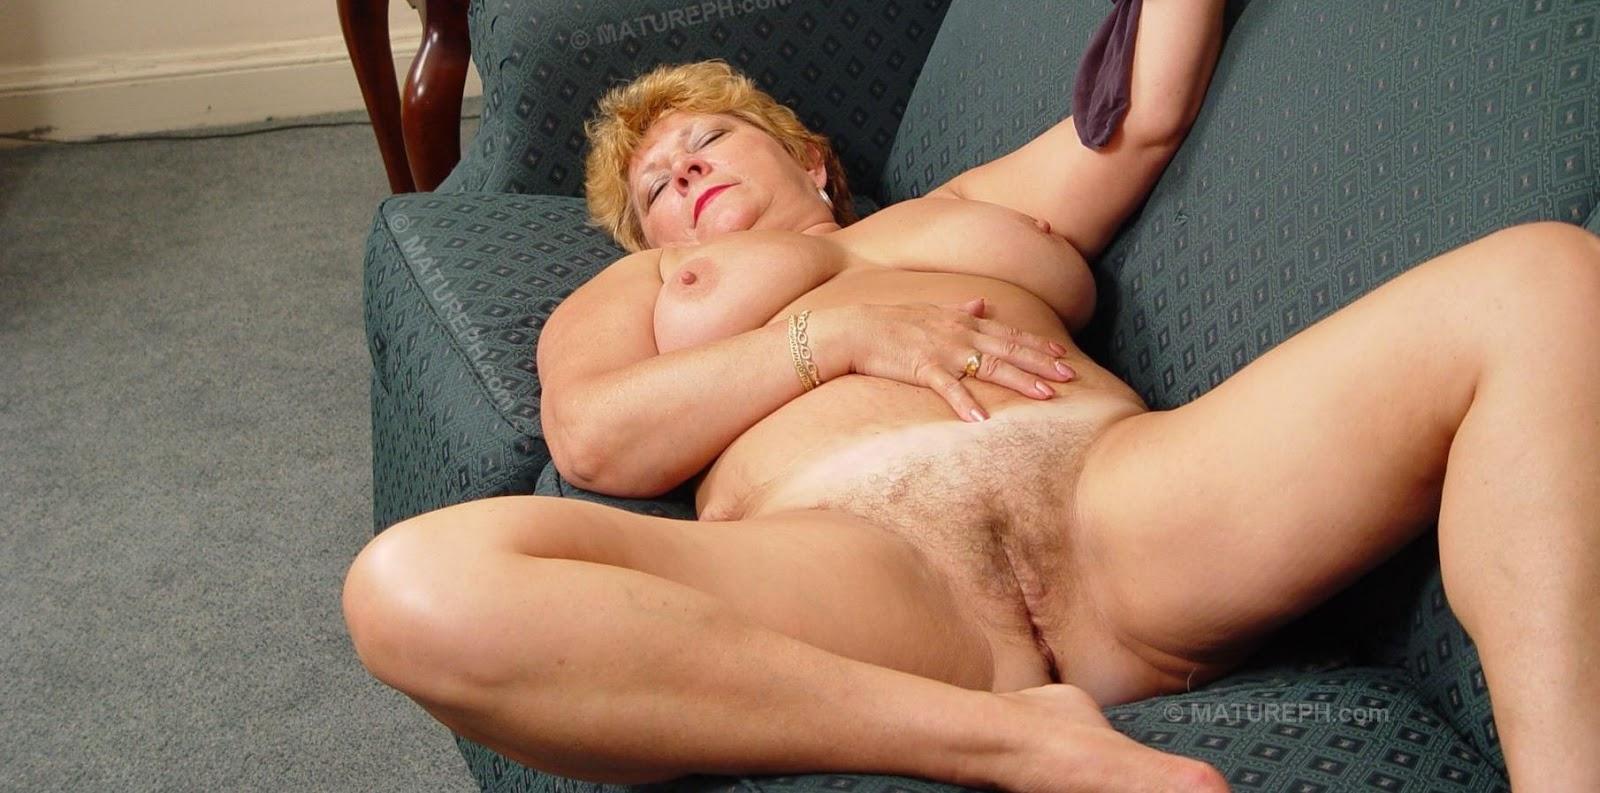 Mature muscle women-5830